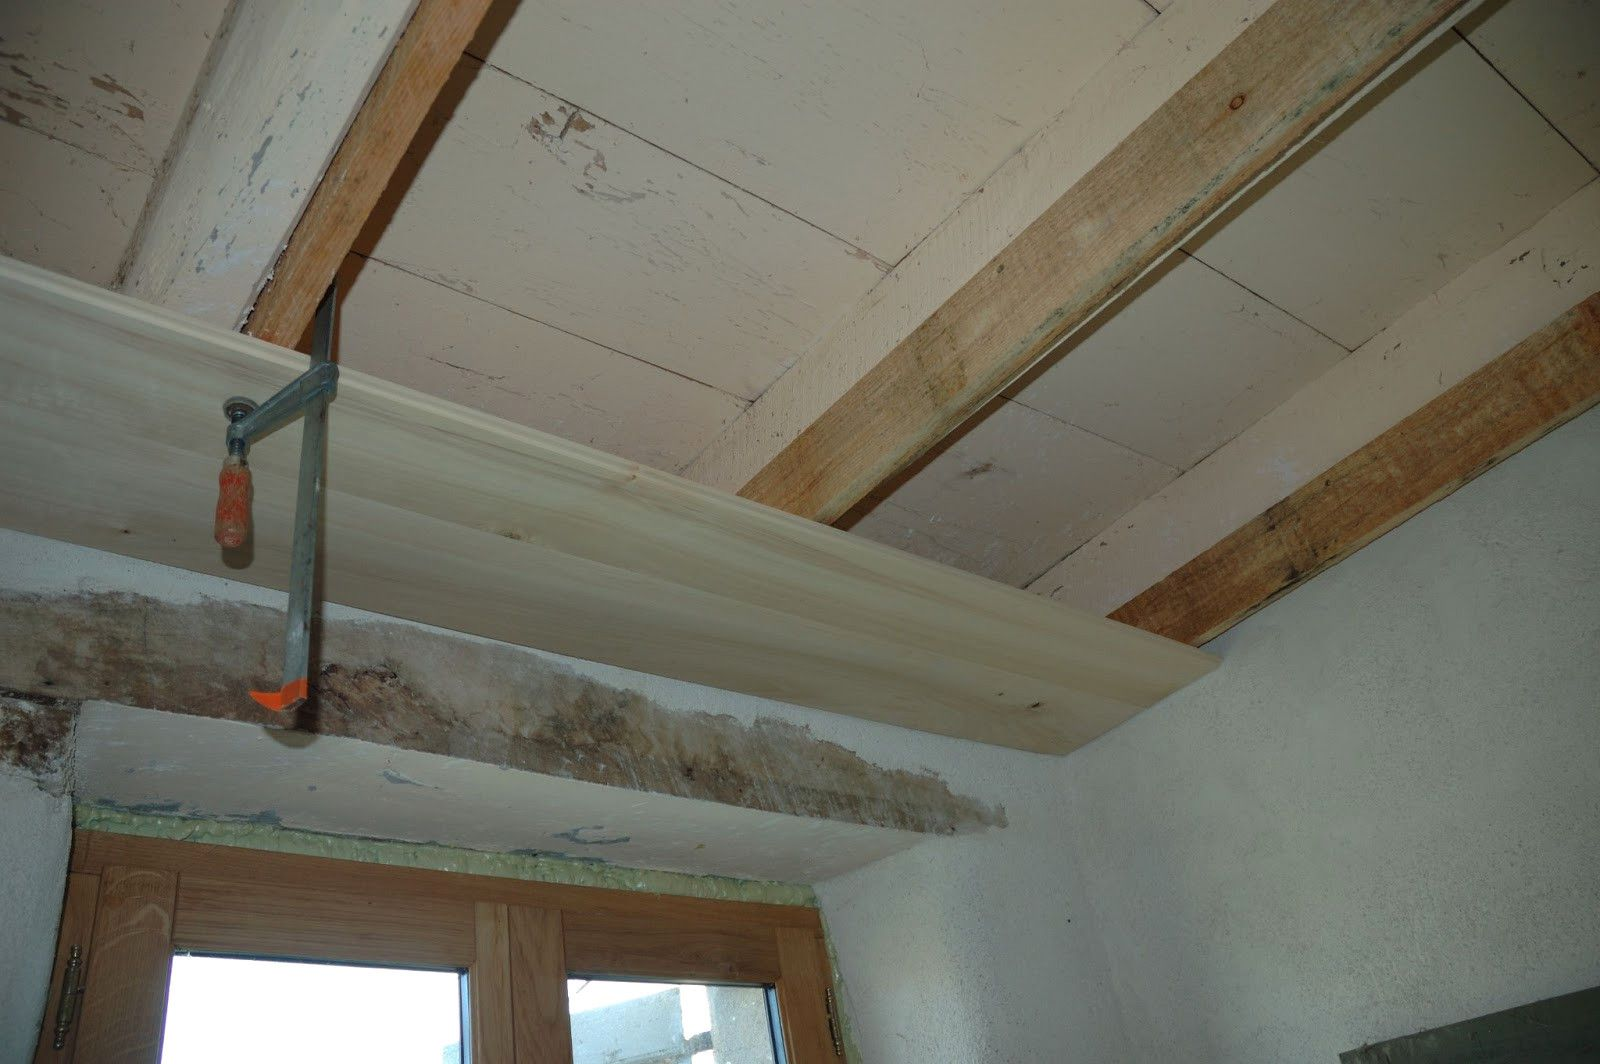 Recouvrir Du Lambris Bois recouvrir du lambris au plafond recouvrir lambris | lambris